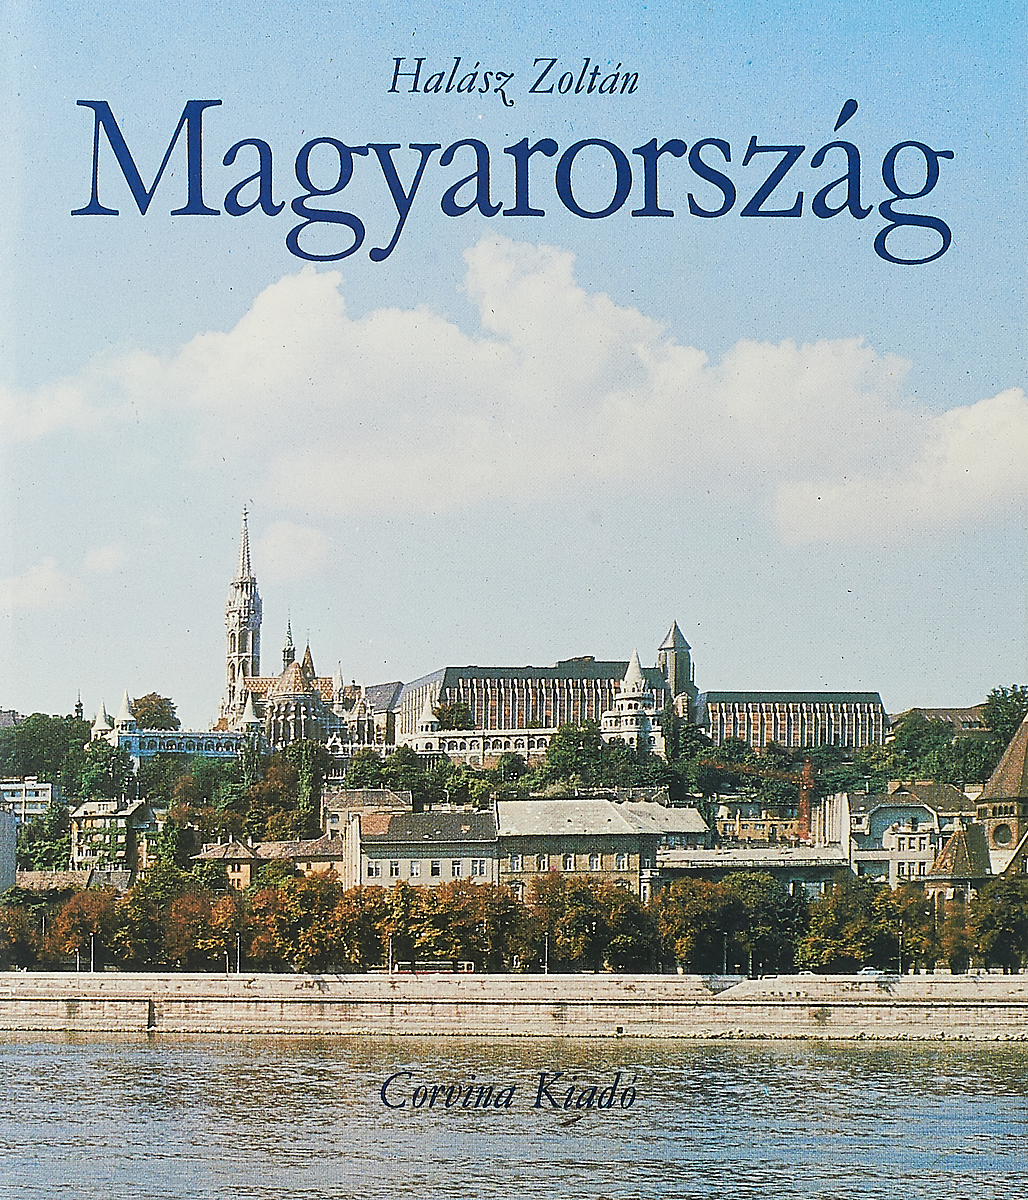 H. Zoltan Magyarorszag